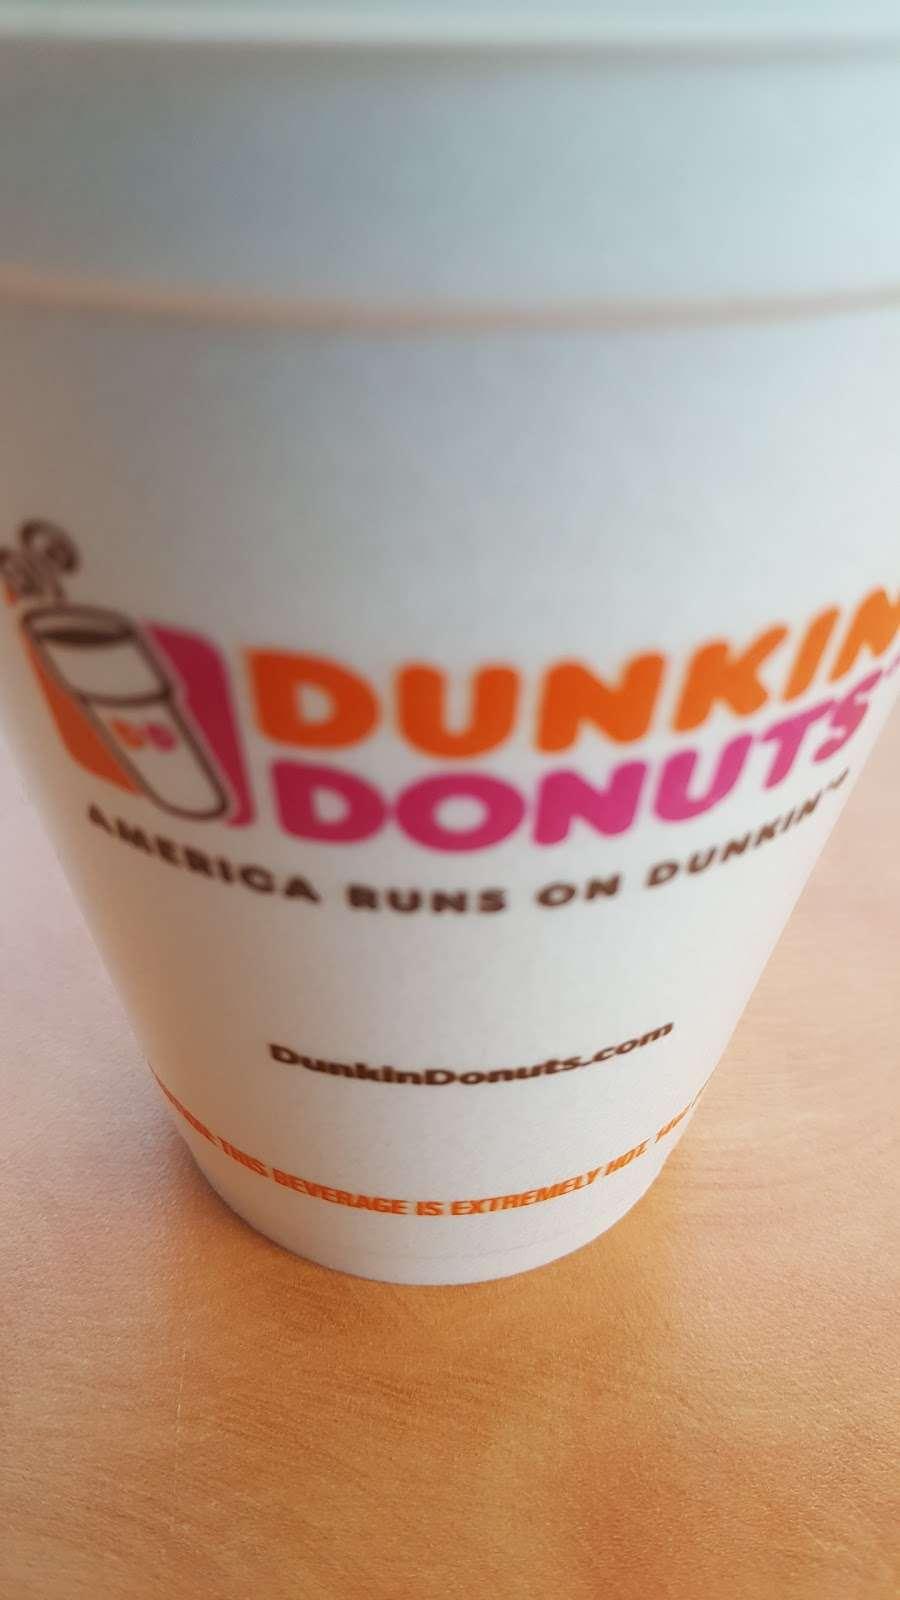 Dunkin Donuts - cafe  | Photo 10 of 10 | Address: 100 Springside Rancocas Rd Rte 635, Westampton, NJ 08060, USA | Phone: (609) 880-1520